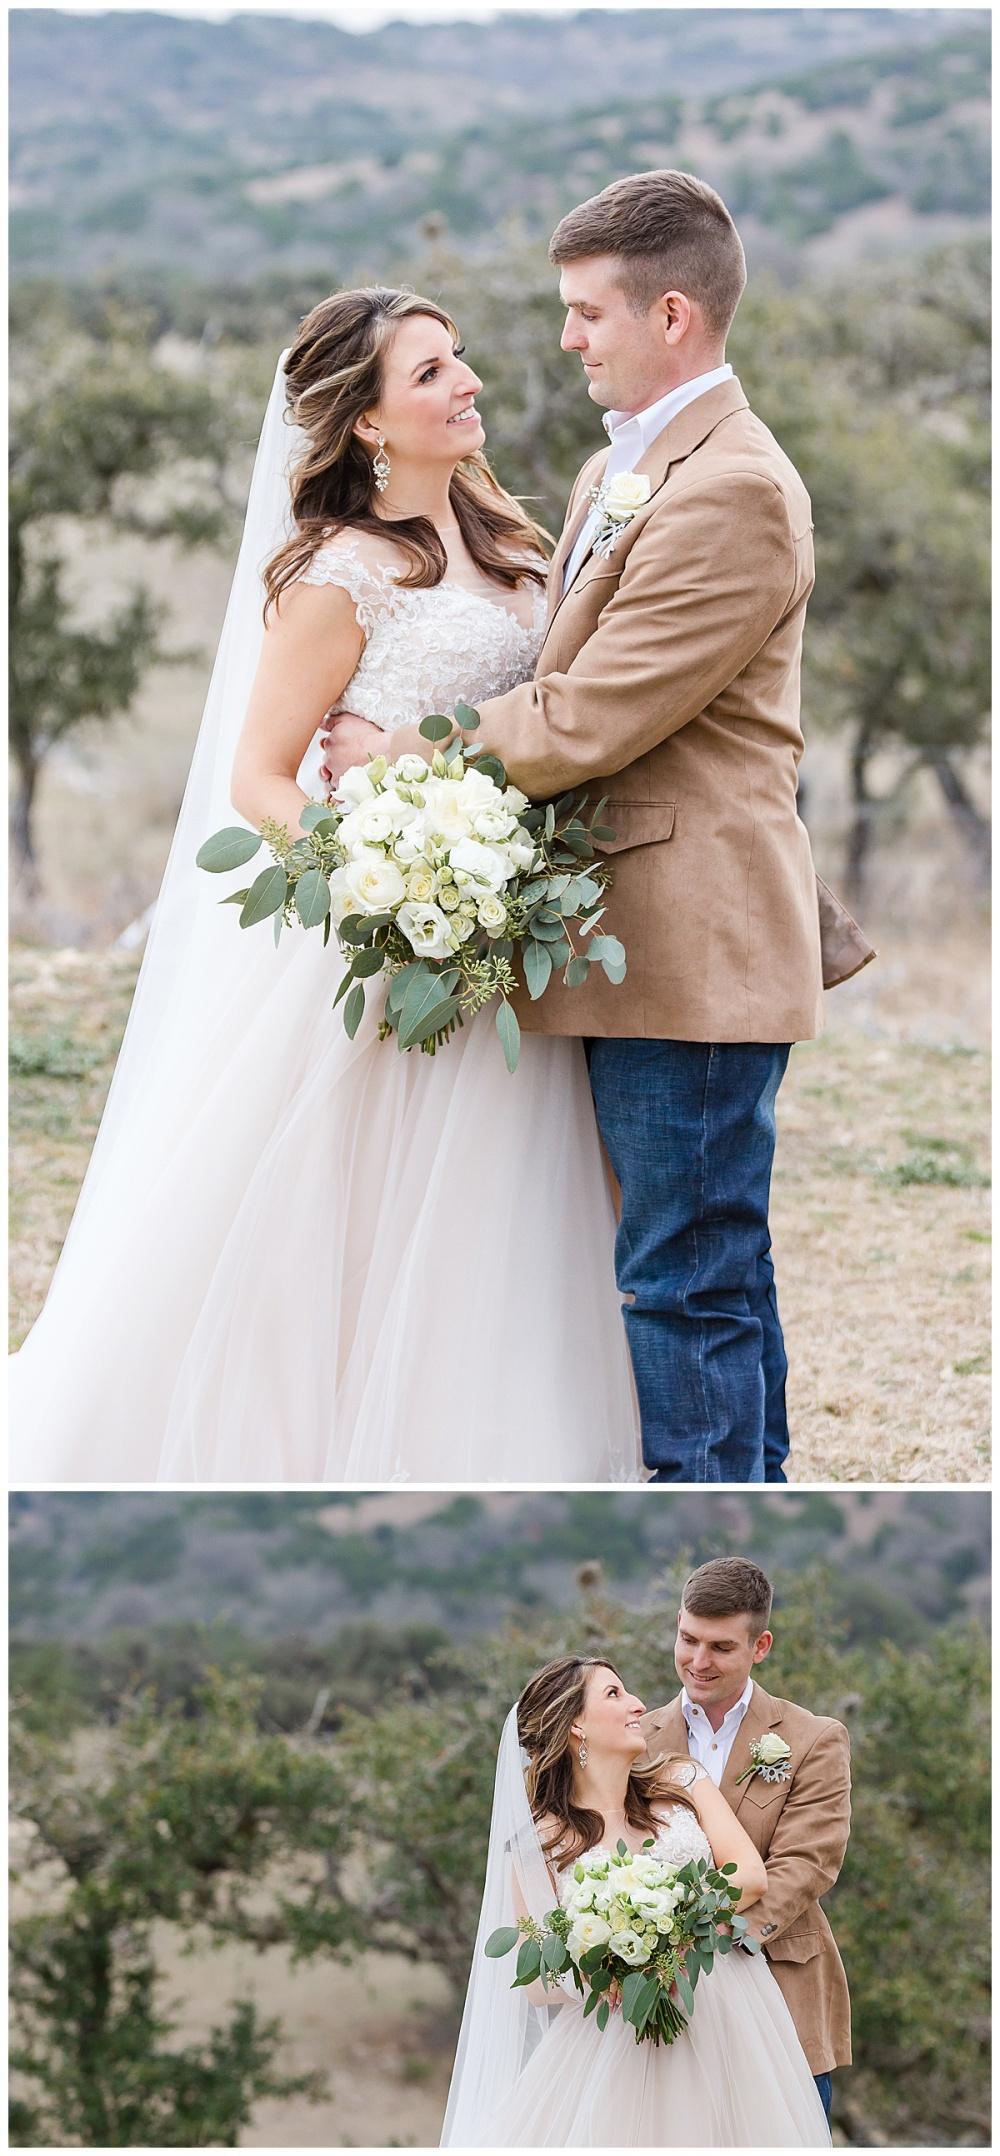 Wedding-Photographer-Texas-Hill-Country-Happy-H-Ranch-Comfor-Texas-Carly-Barton-Photography_0059.jpg